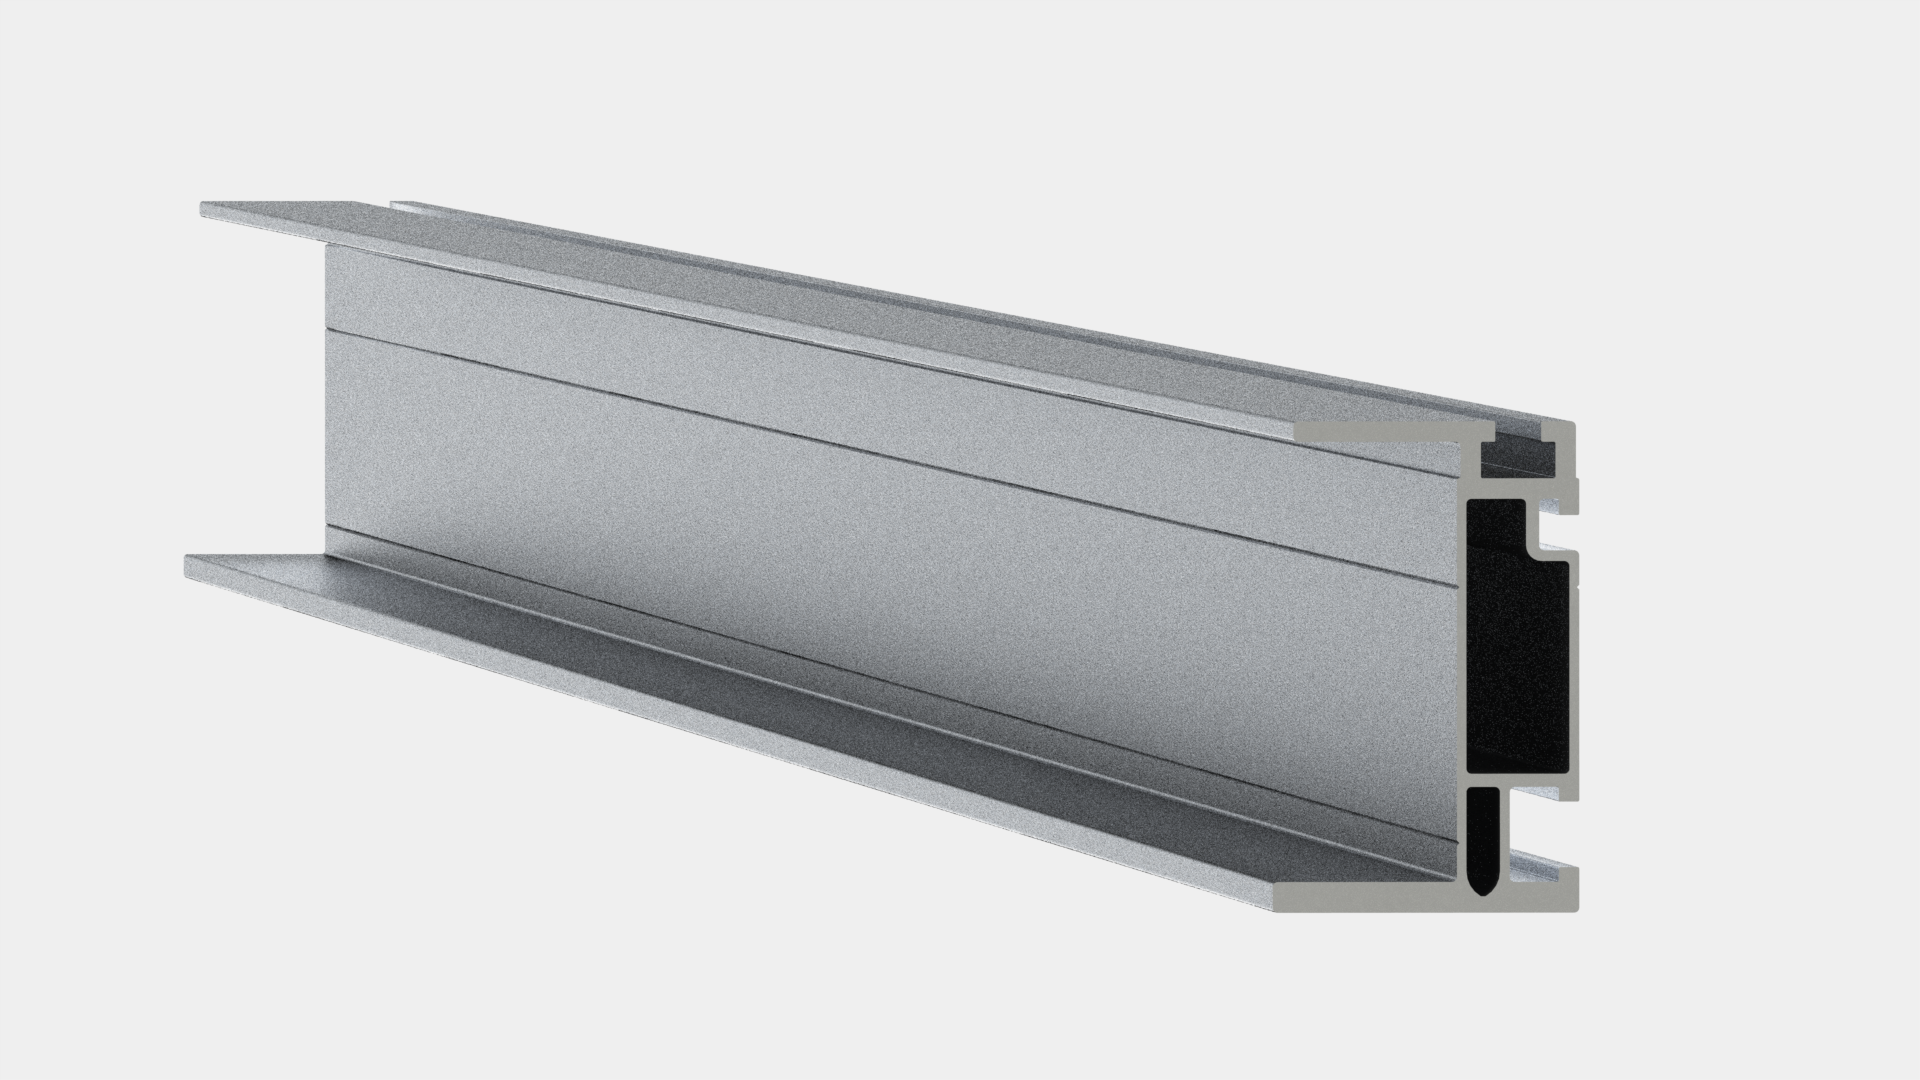 Unirac 410144M UNIRAC 144 Inch Mill Finish Aluminum Solar Mount Heavy Duty Rail